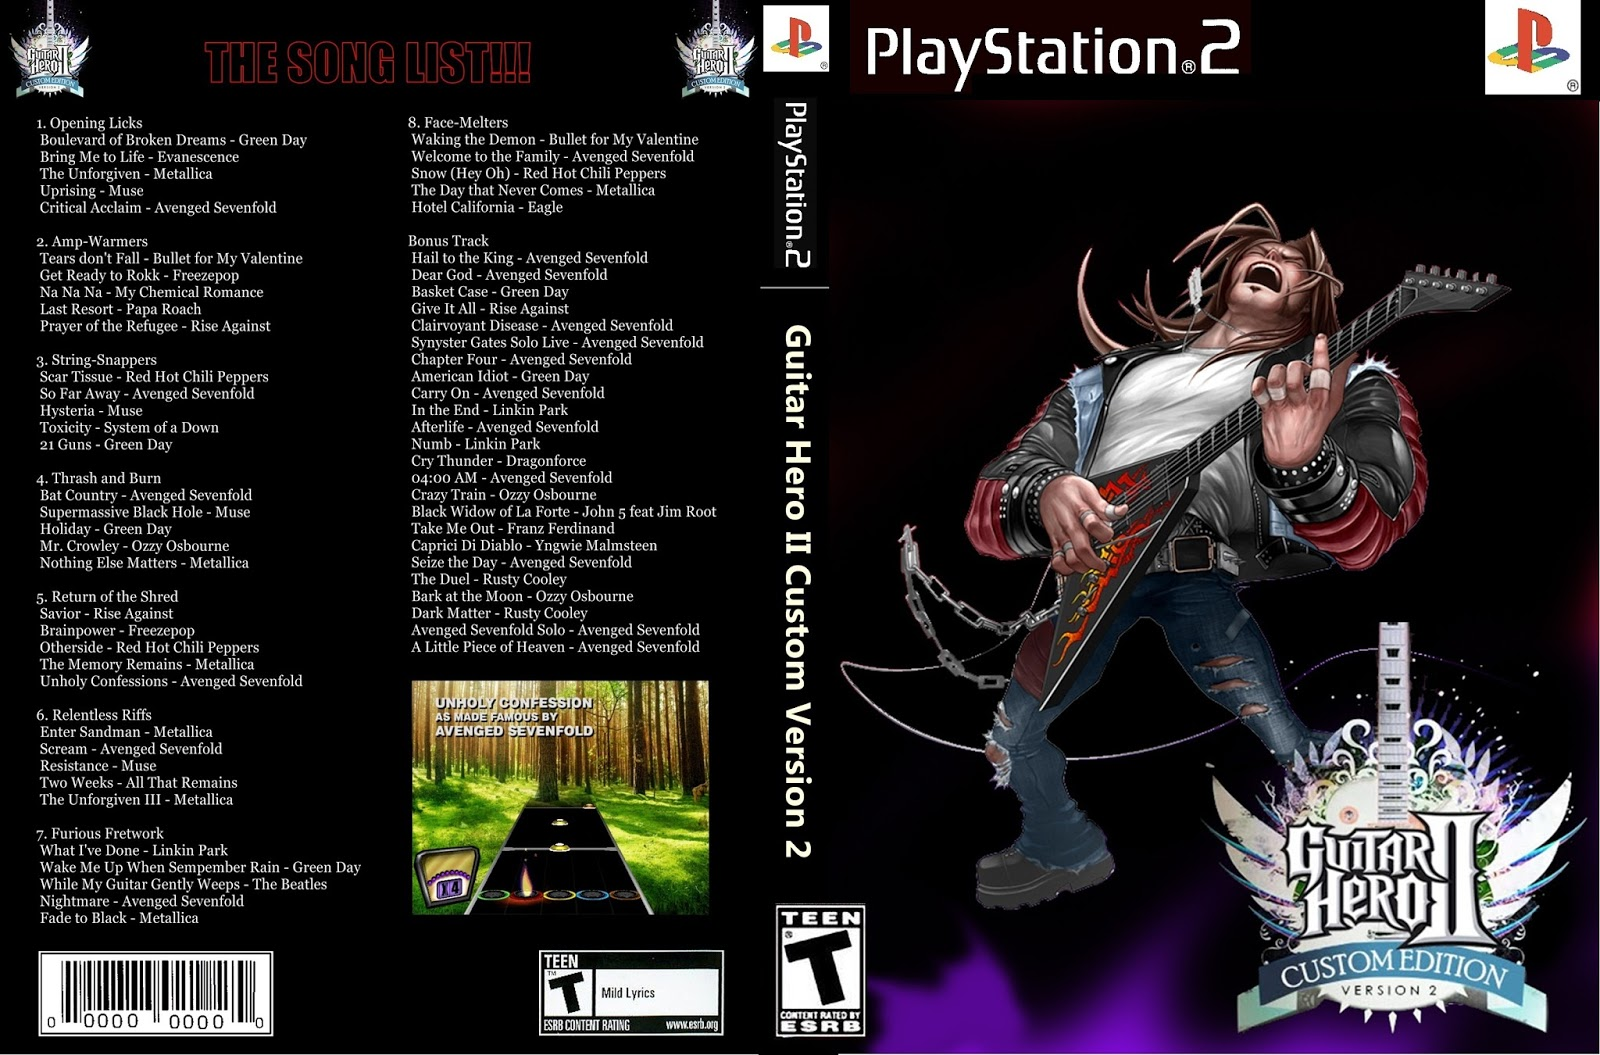 Rizal Mamen Blog: Jual Guitar Hero 2 Custom Version 2 Ps2